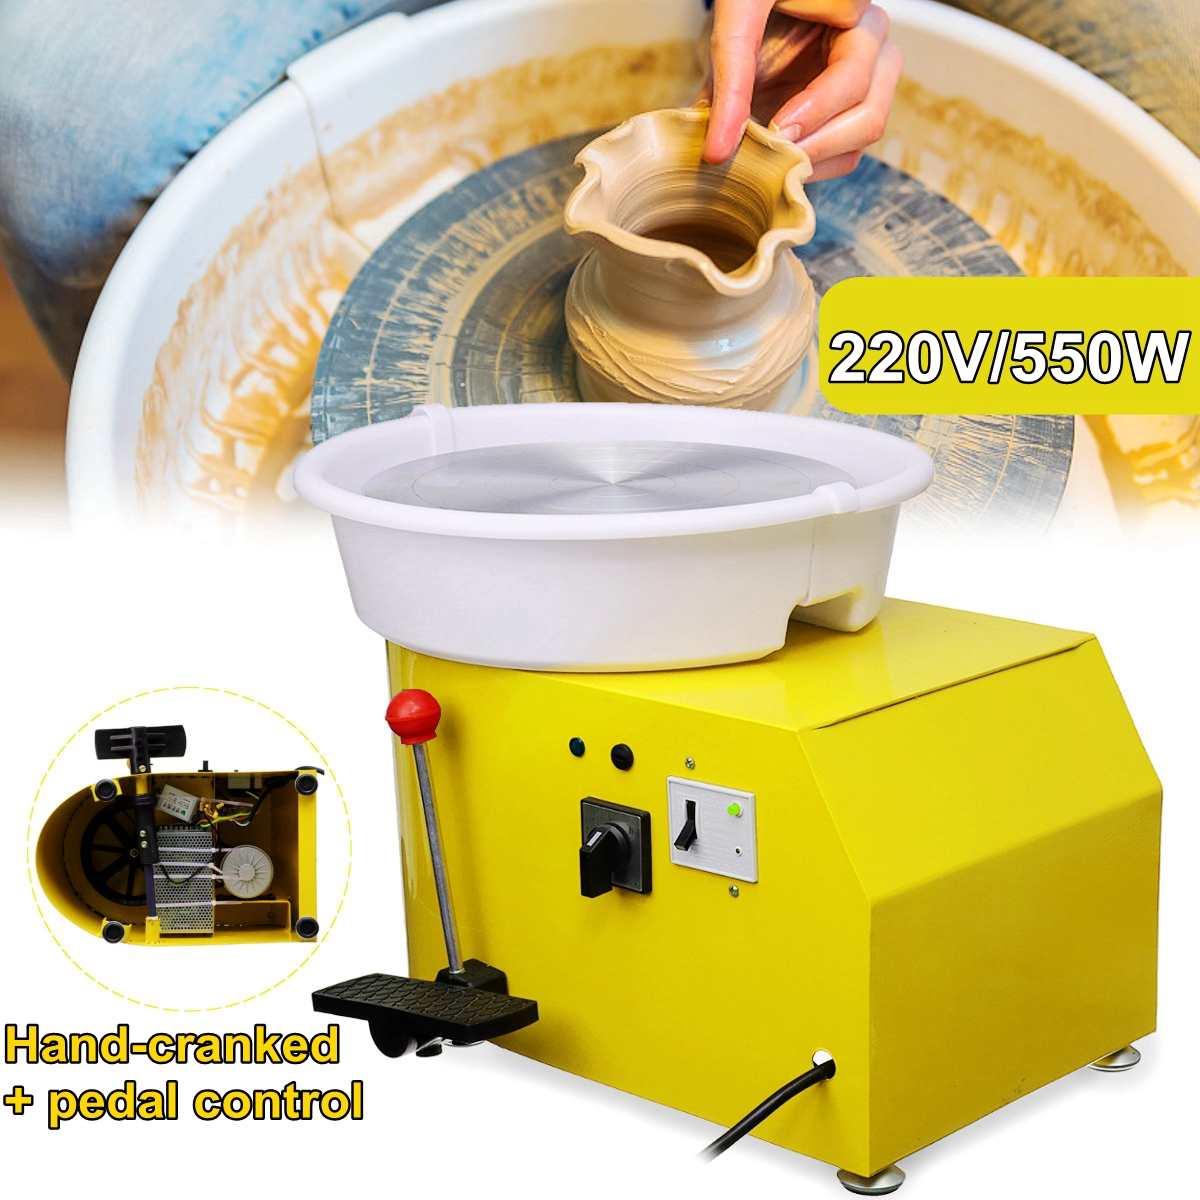 Turning Electric Pottery Wheel Ceramic Machine 220V 550W 300mm Ceramic Clay Potter Kit For Ceramic Work CeramicsTurning Electric Pottery Wheel Ceramic Machine 220V 550W 300mm Ceramic Clay Potter Kit For Ceramic Work Ceramics